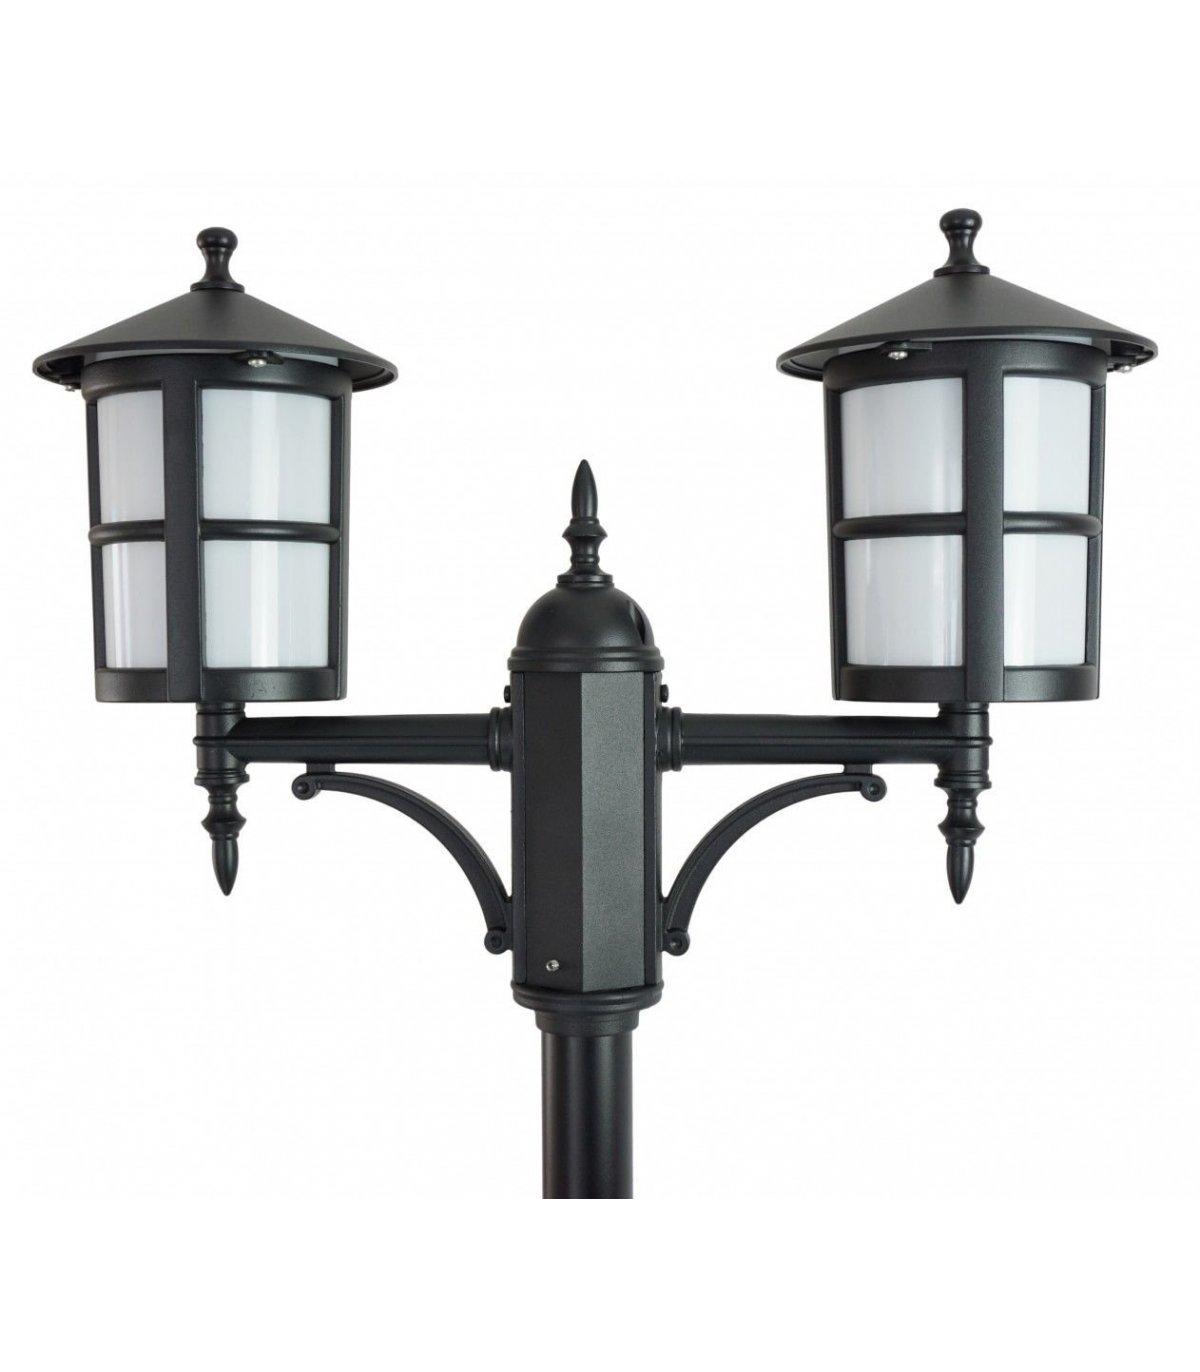 CORDOBA II lampa wisząca sklep LEDco.pl